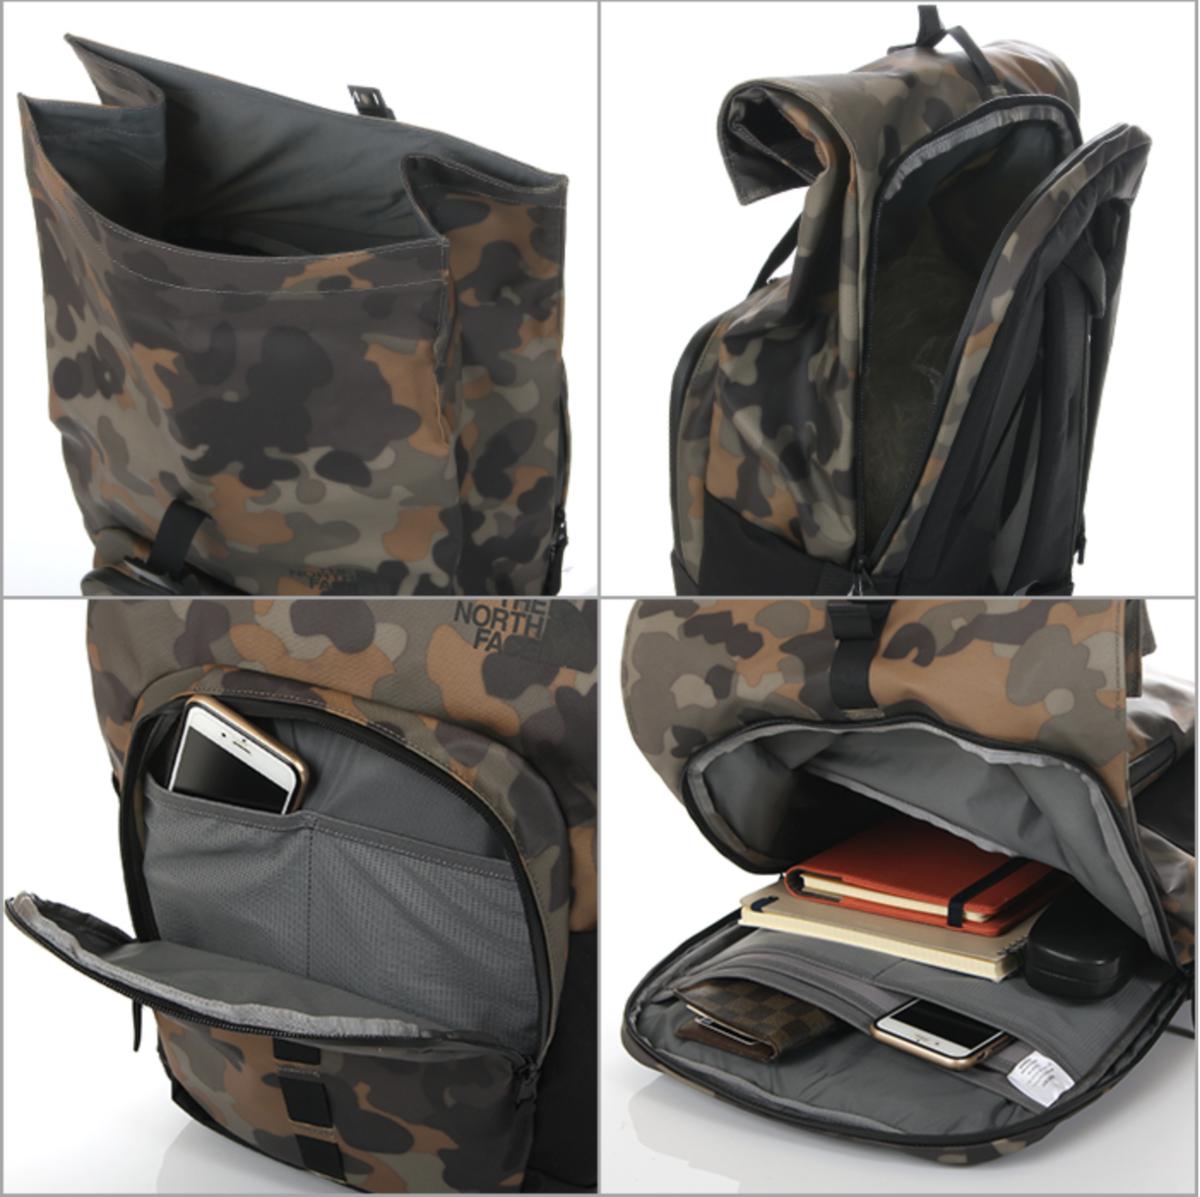 f:id:thebackpack:20190402181430p:plain